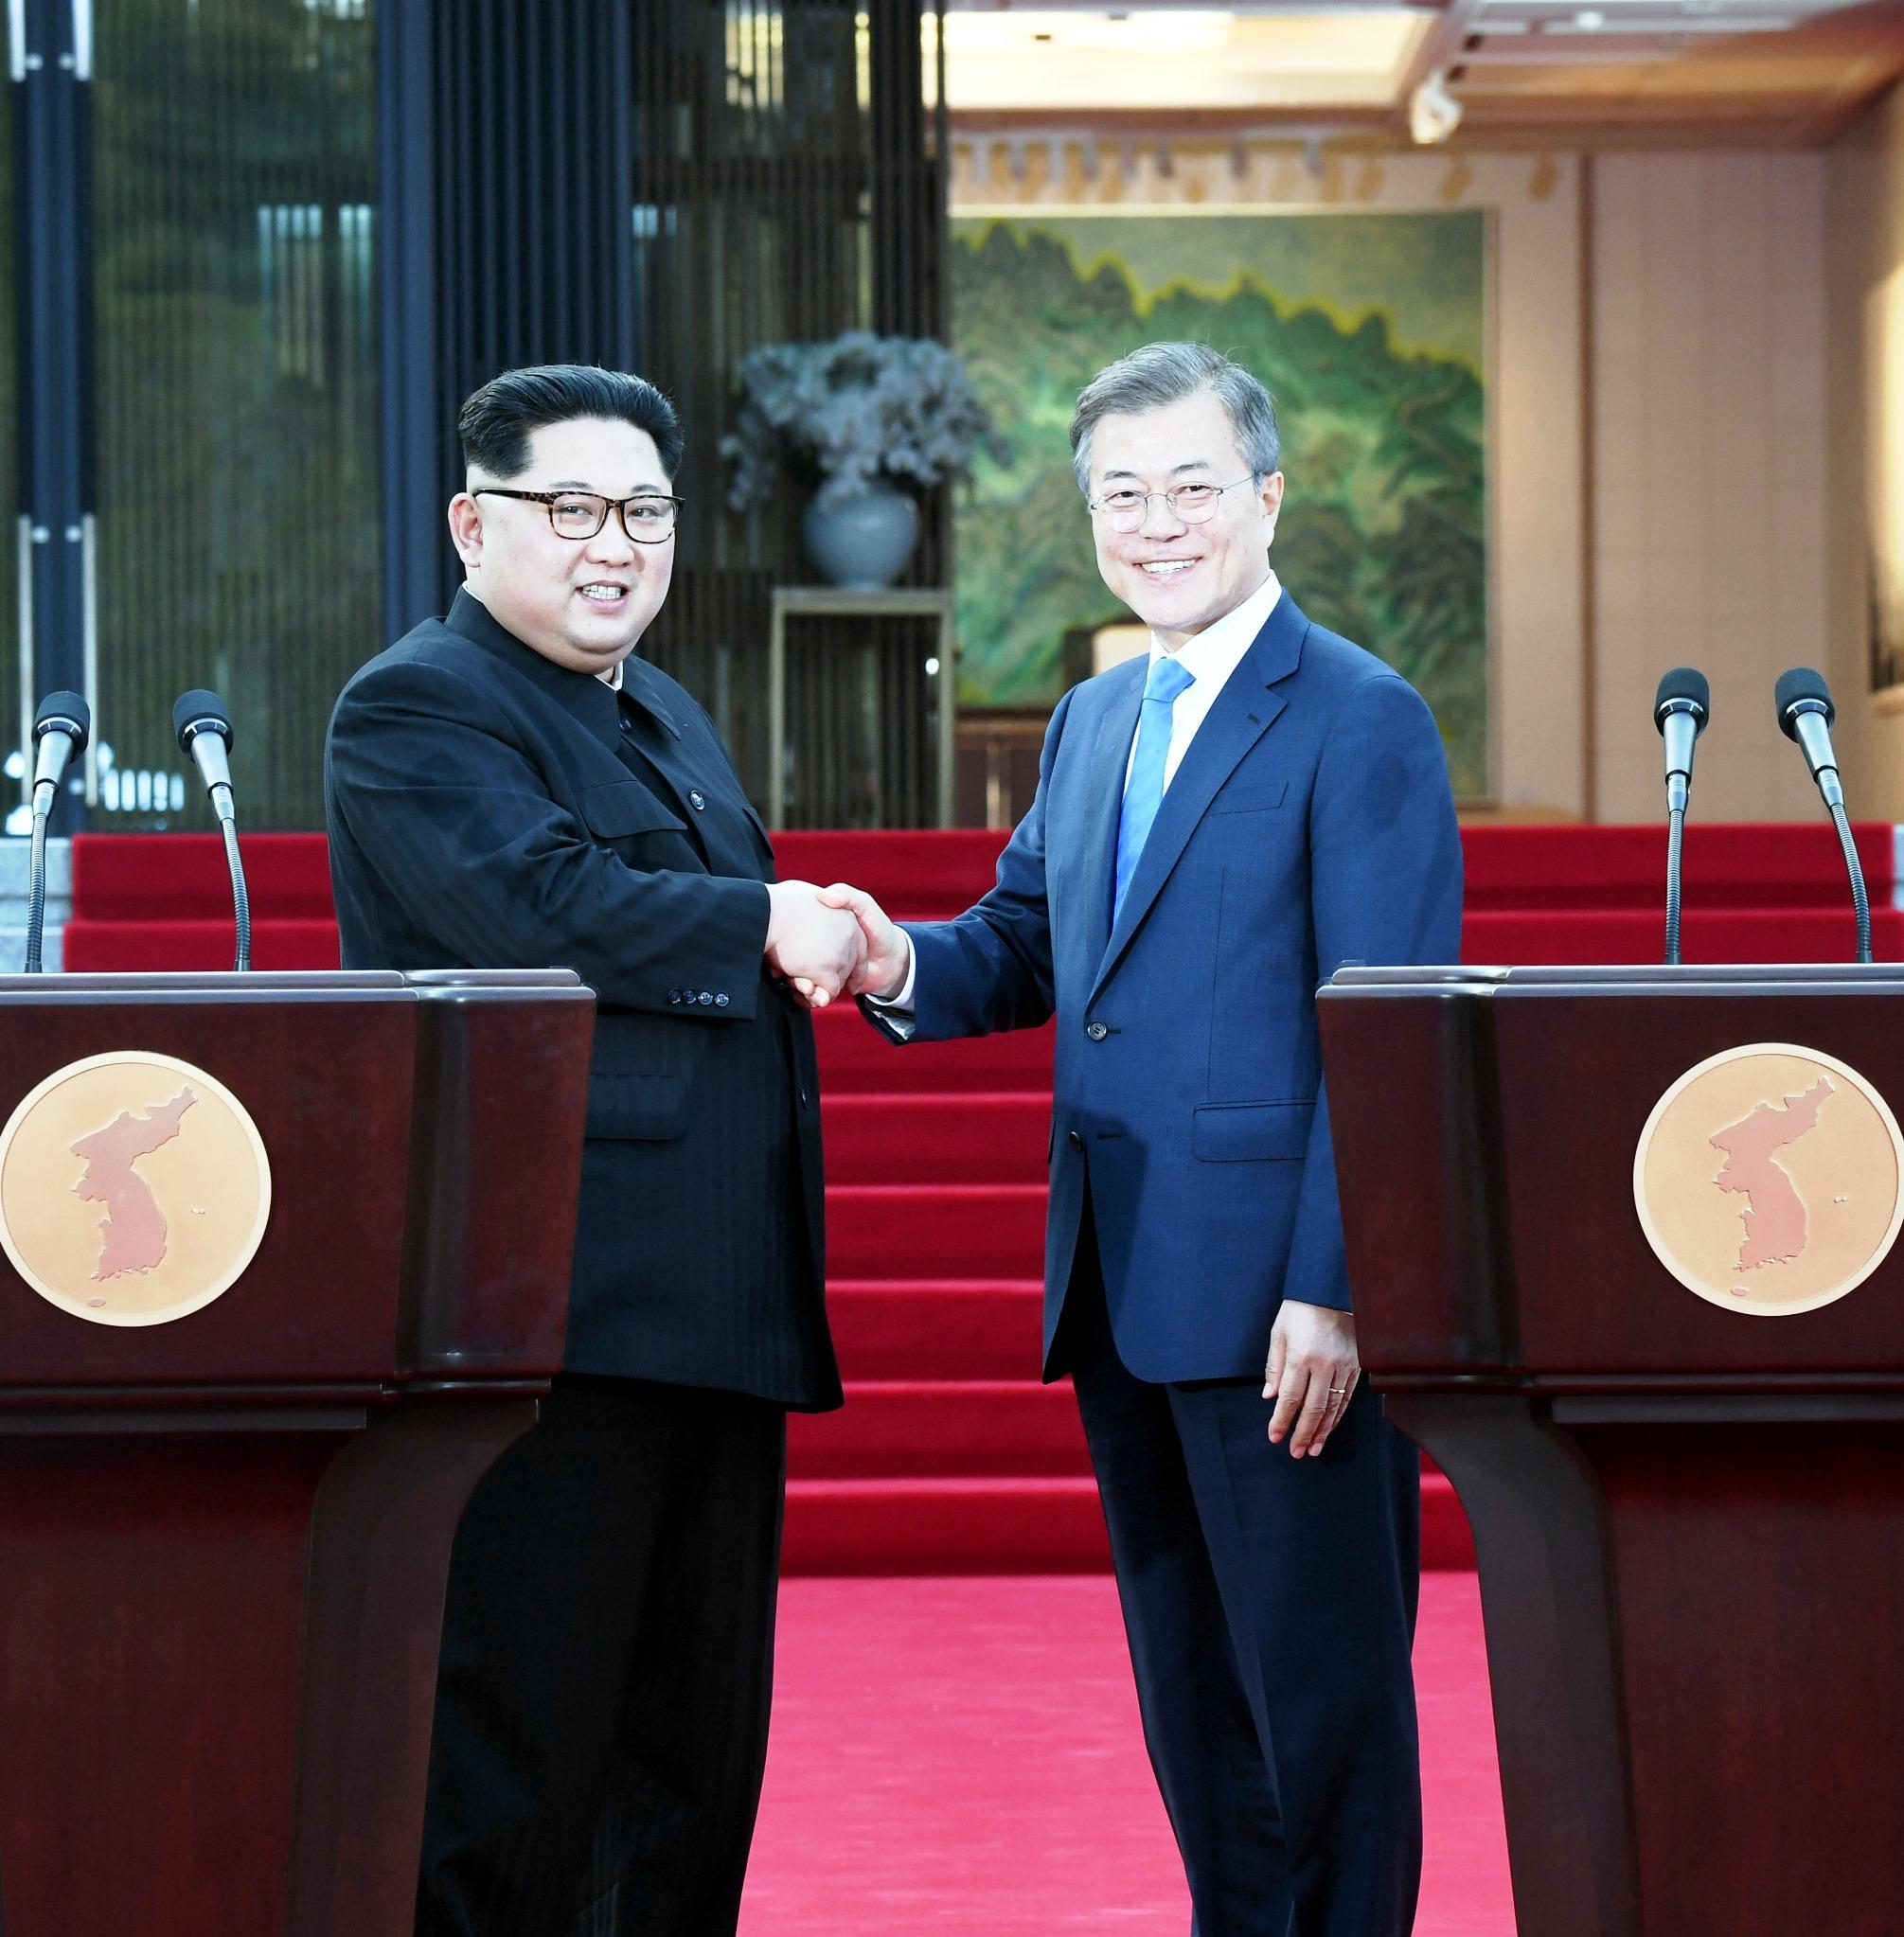 ¿Cuánto mide Kim Jong Un? - Real height Kim-Jong-un-Moon-Jae-in-Corea-del-Sur-Corea-del-Norte-DPA